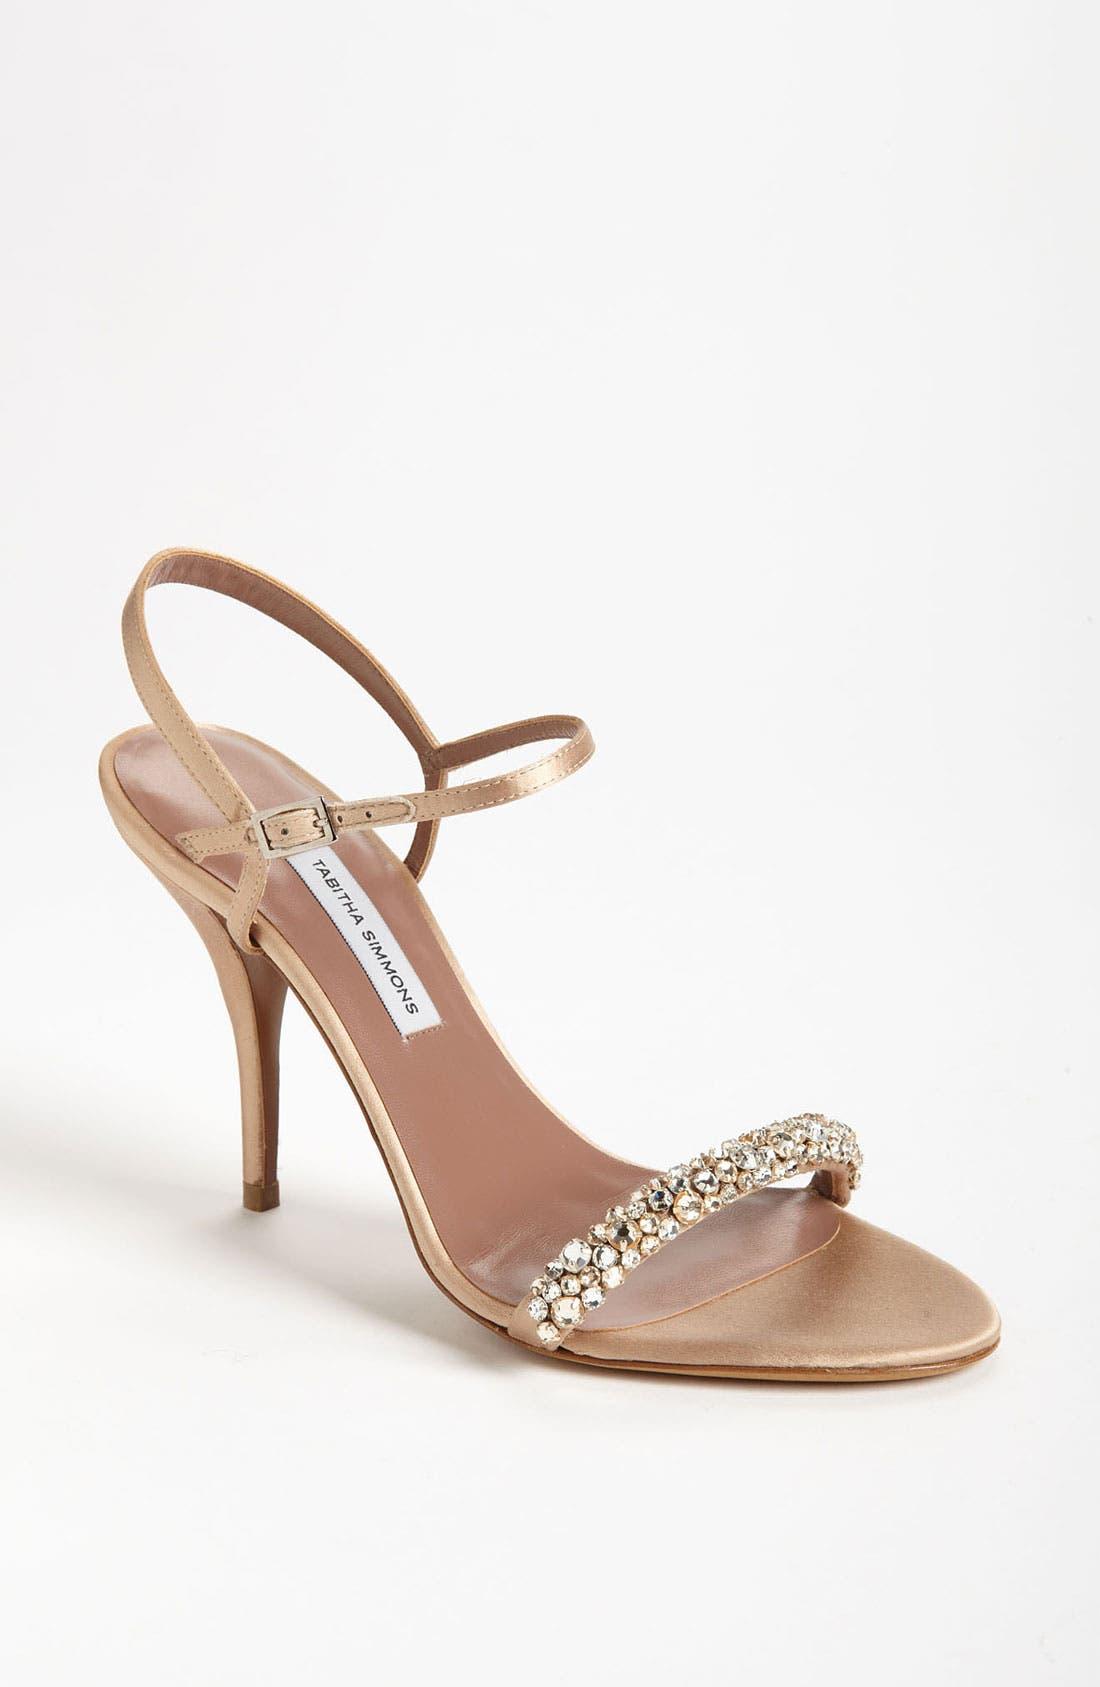 Main Image - Tabitha Simmons 'Deon' Sandal